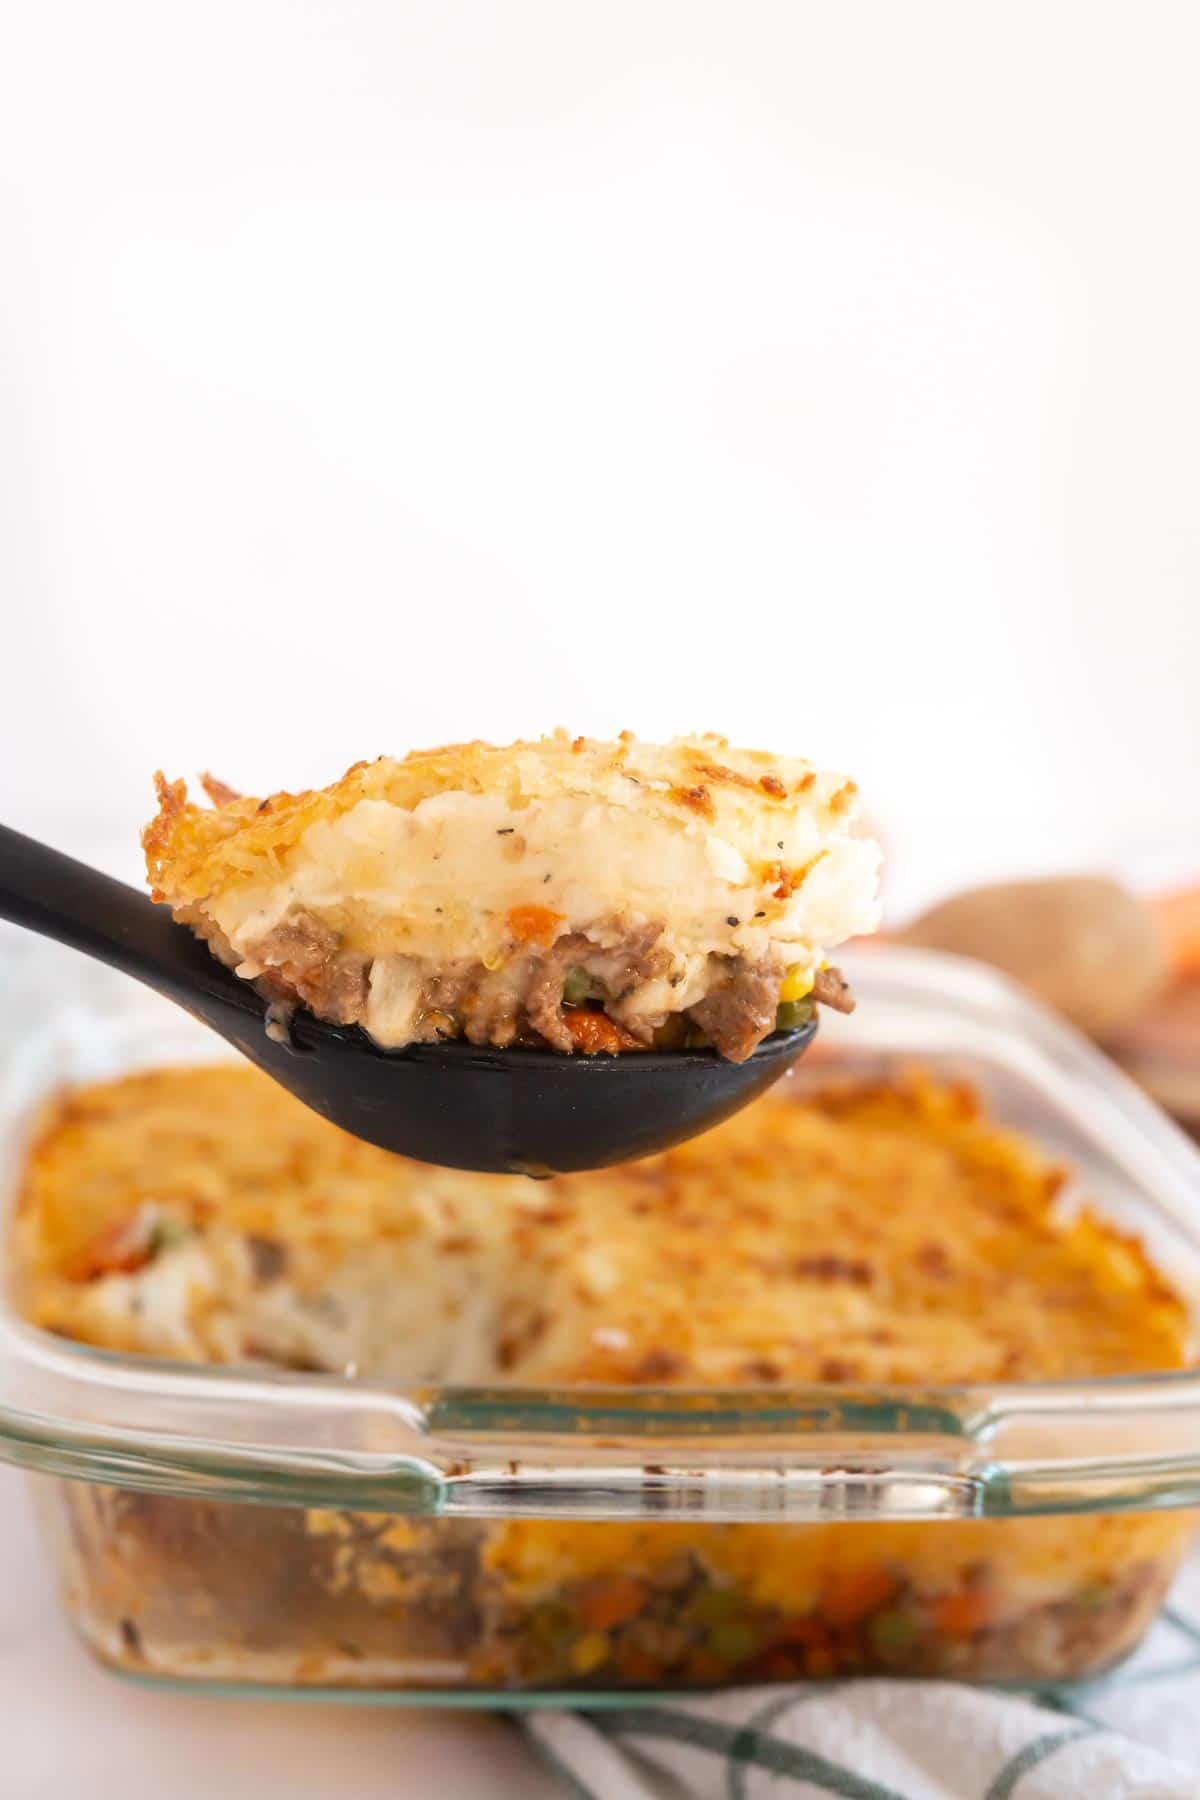 Spoon full of shepherd's pie in front of a pan of shepherd's pie